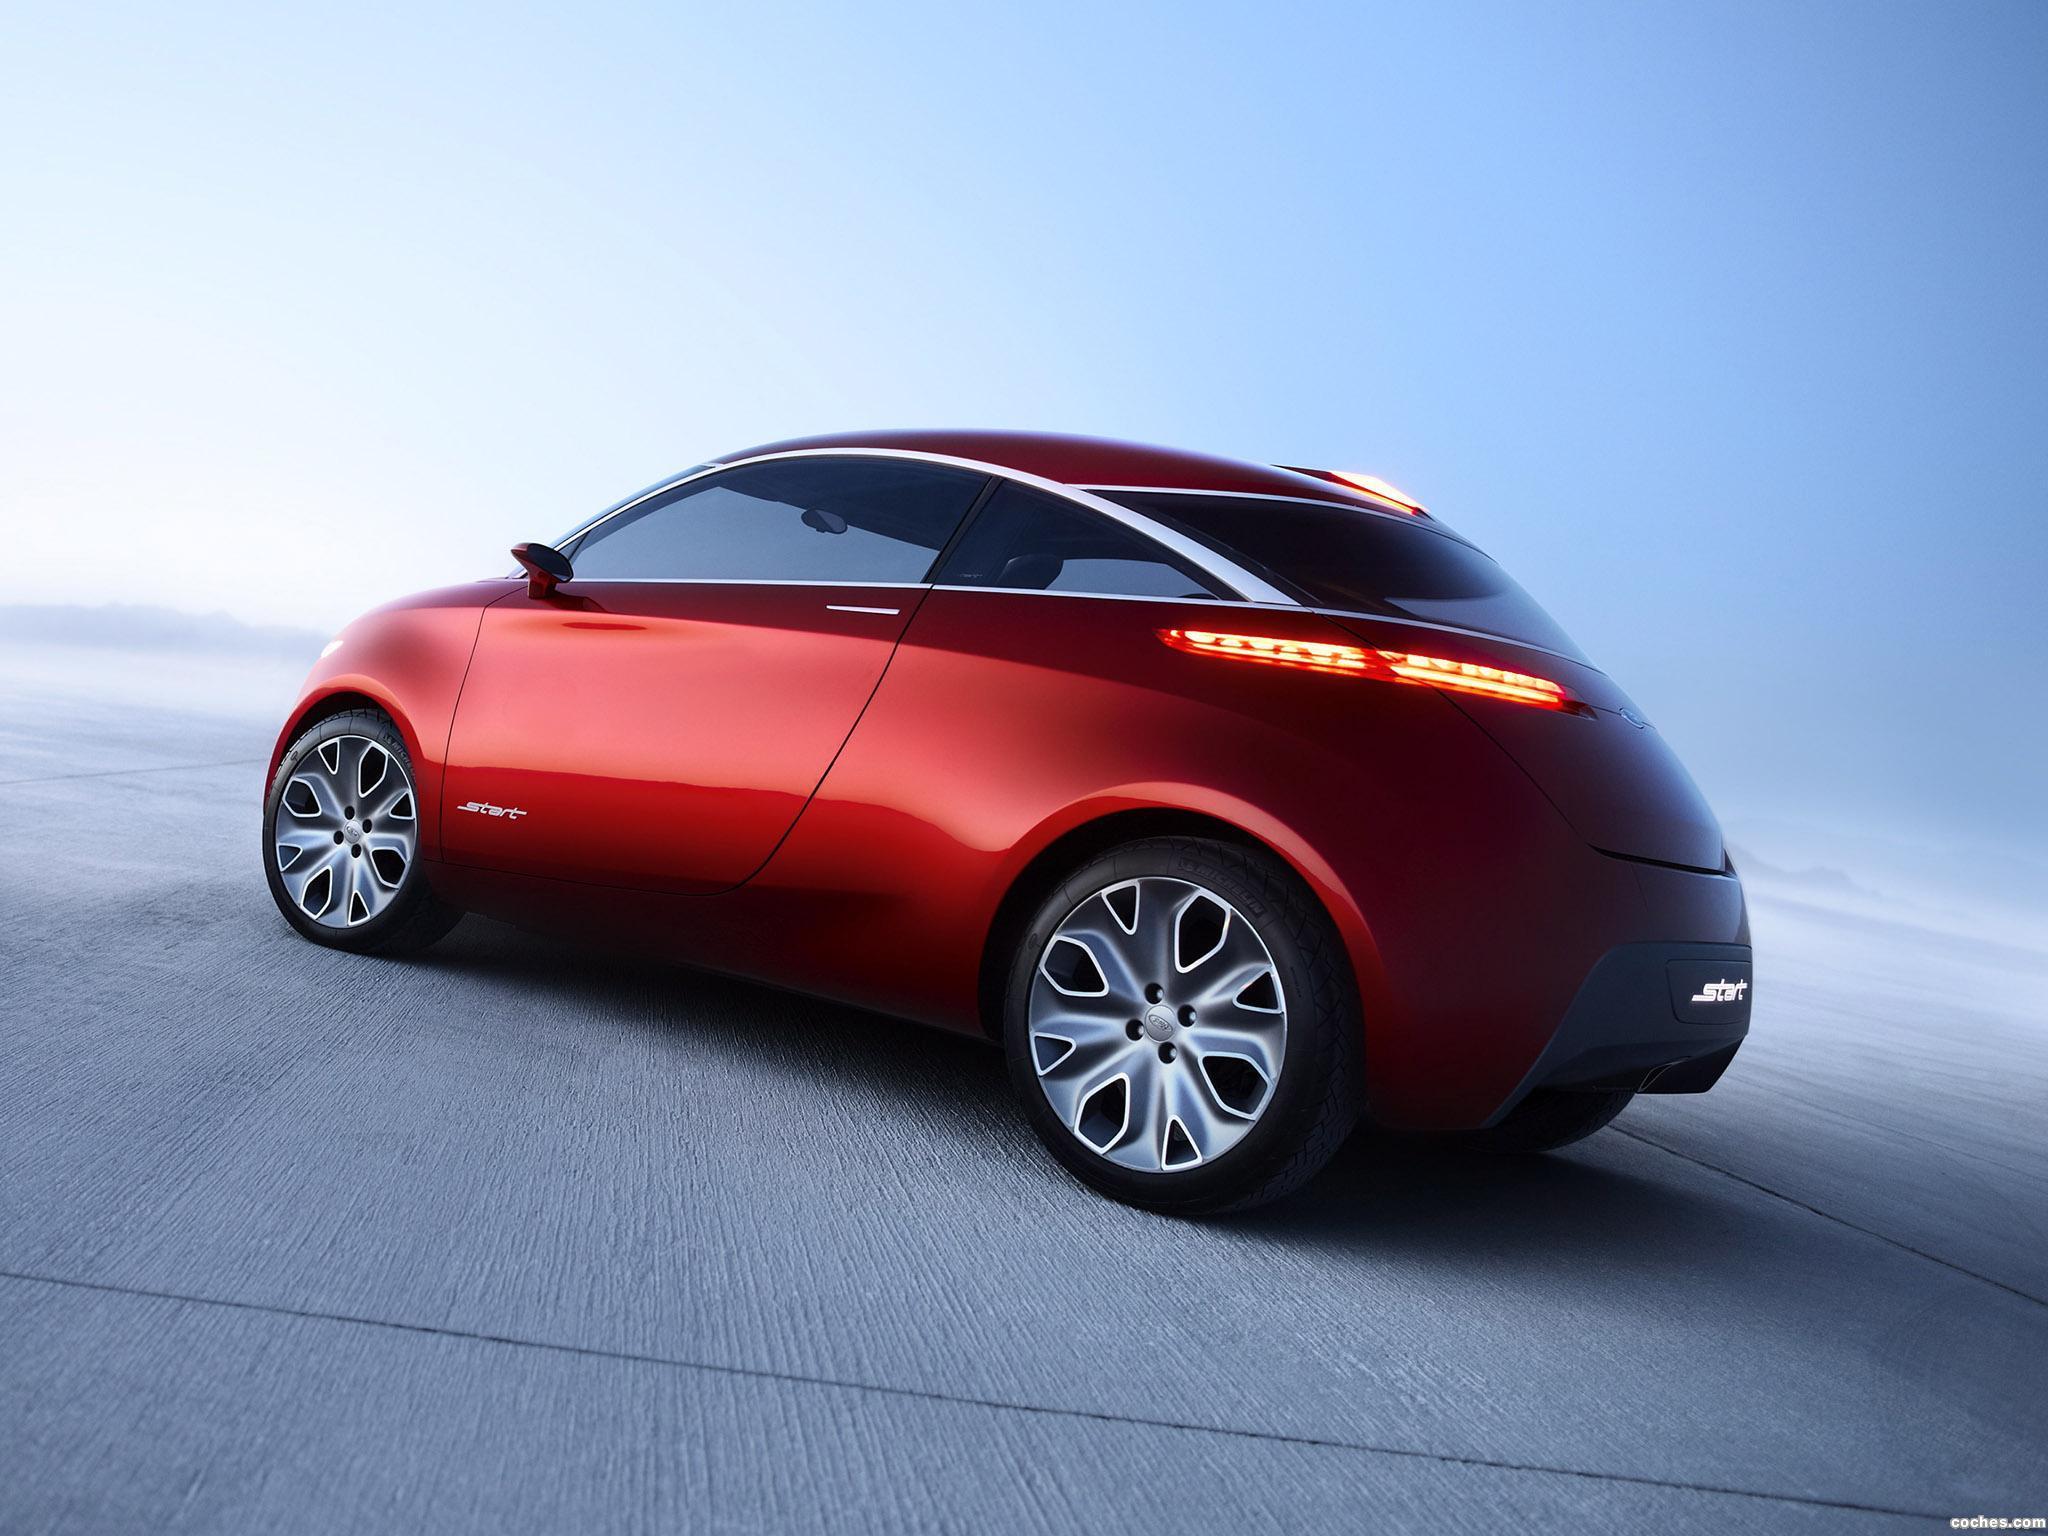 Foto 1 de Ford Start Concept 2010